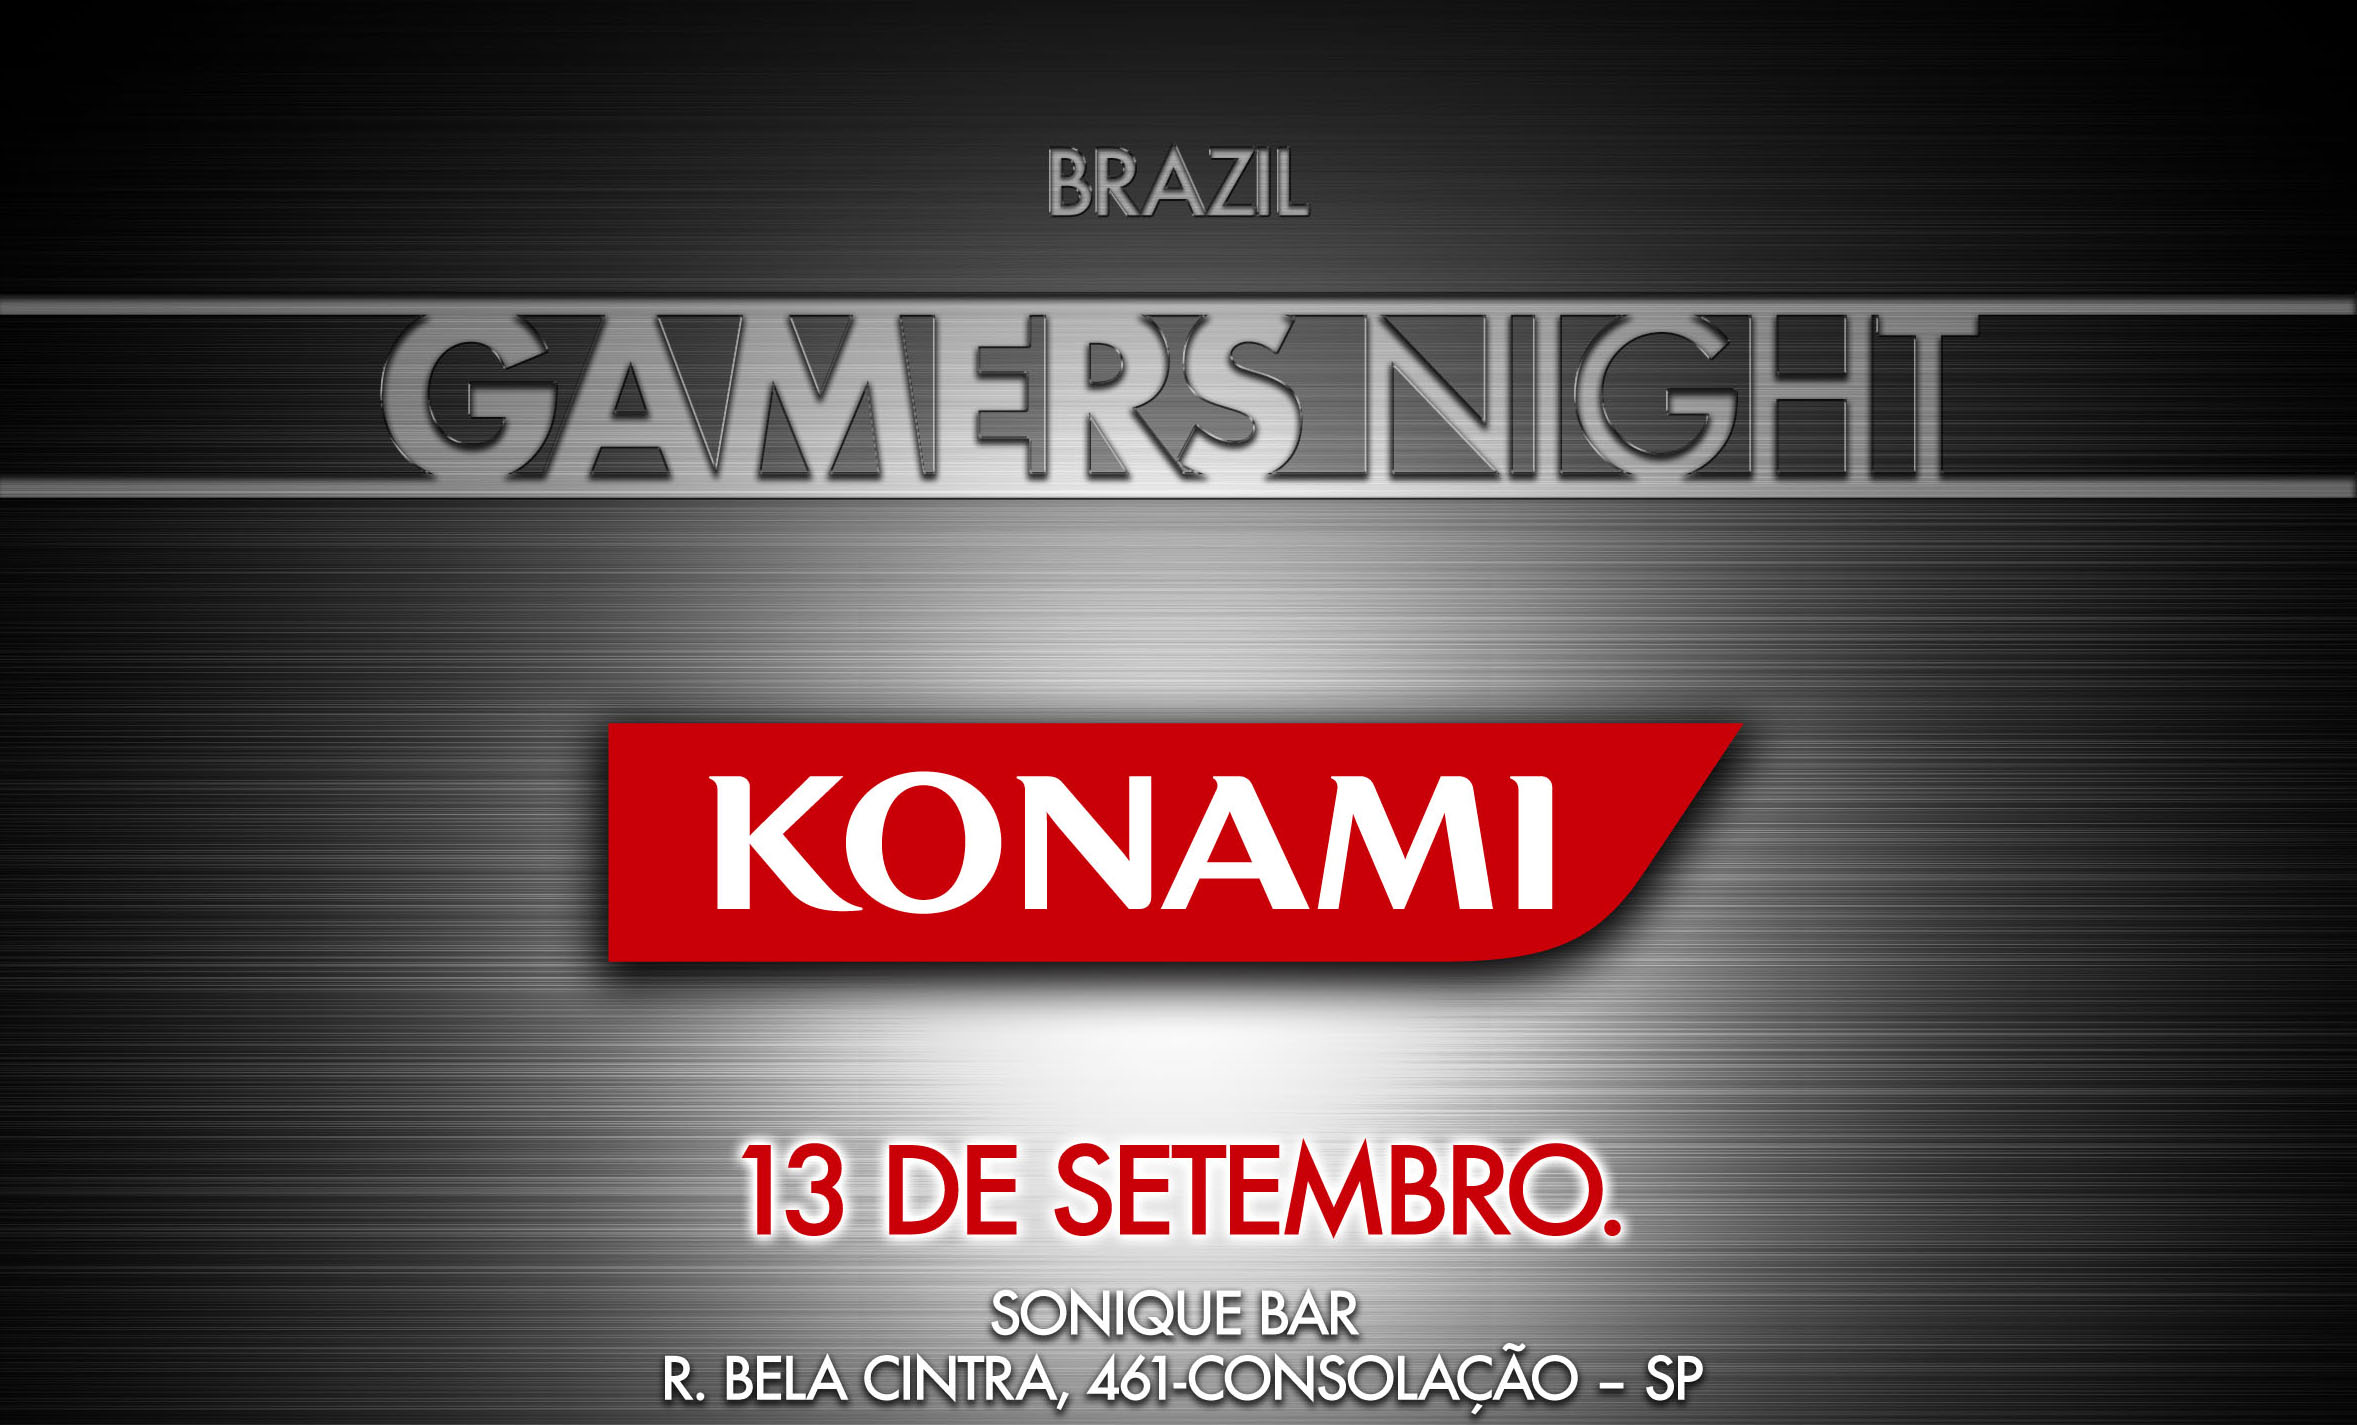 Brazil gamers night - Konami flyer